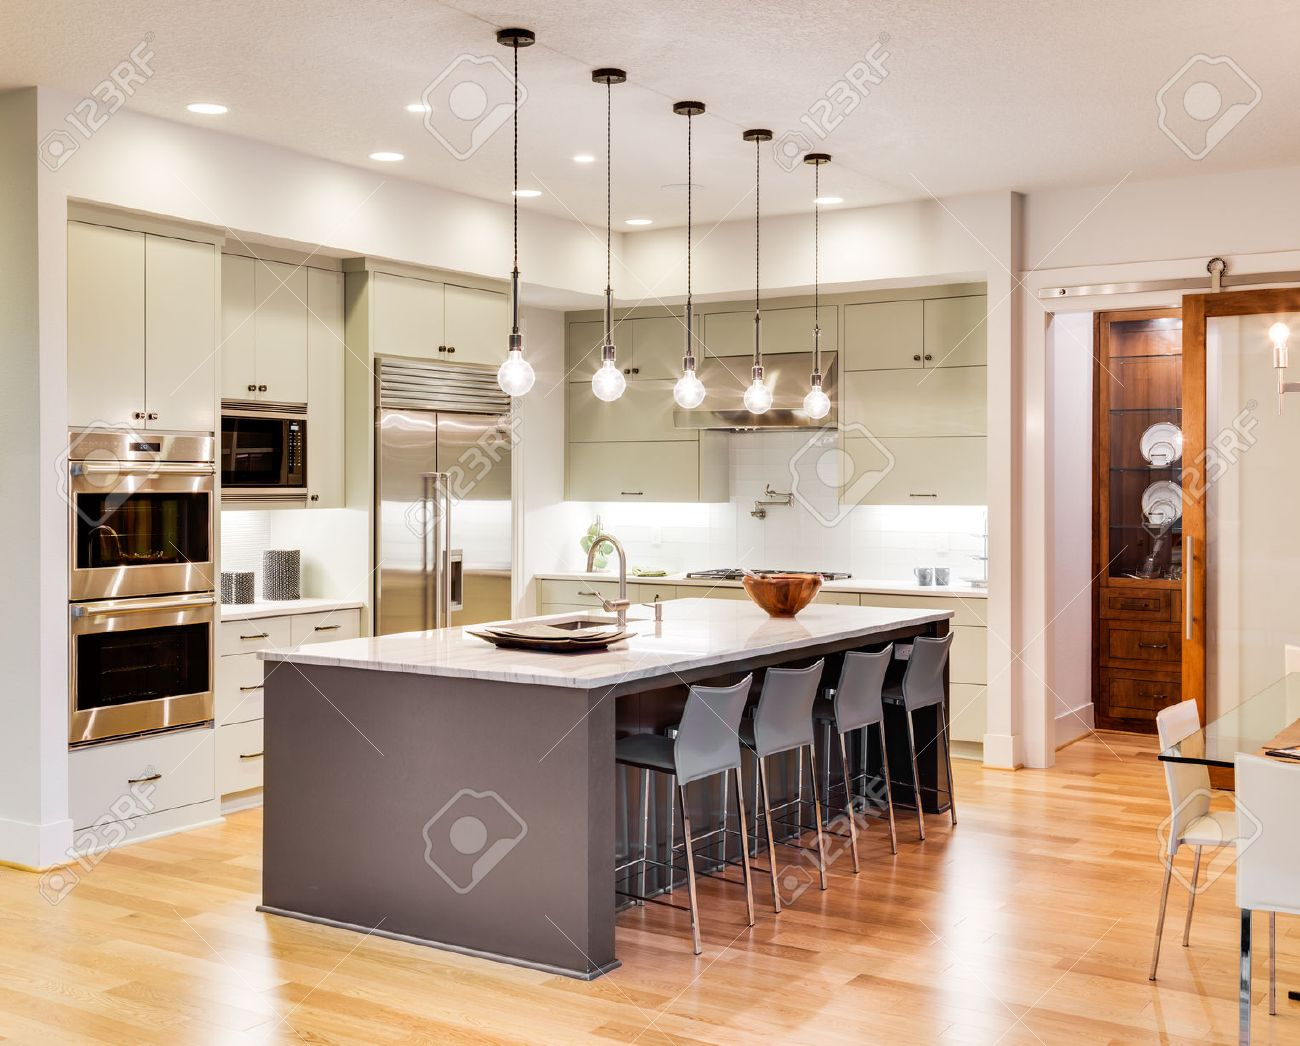 cocina moderna cocina con isla fregadero armarios y pisos de madera en